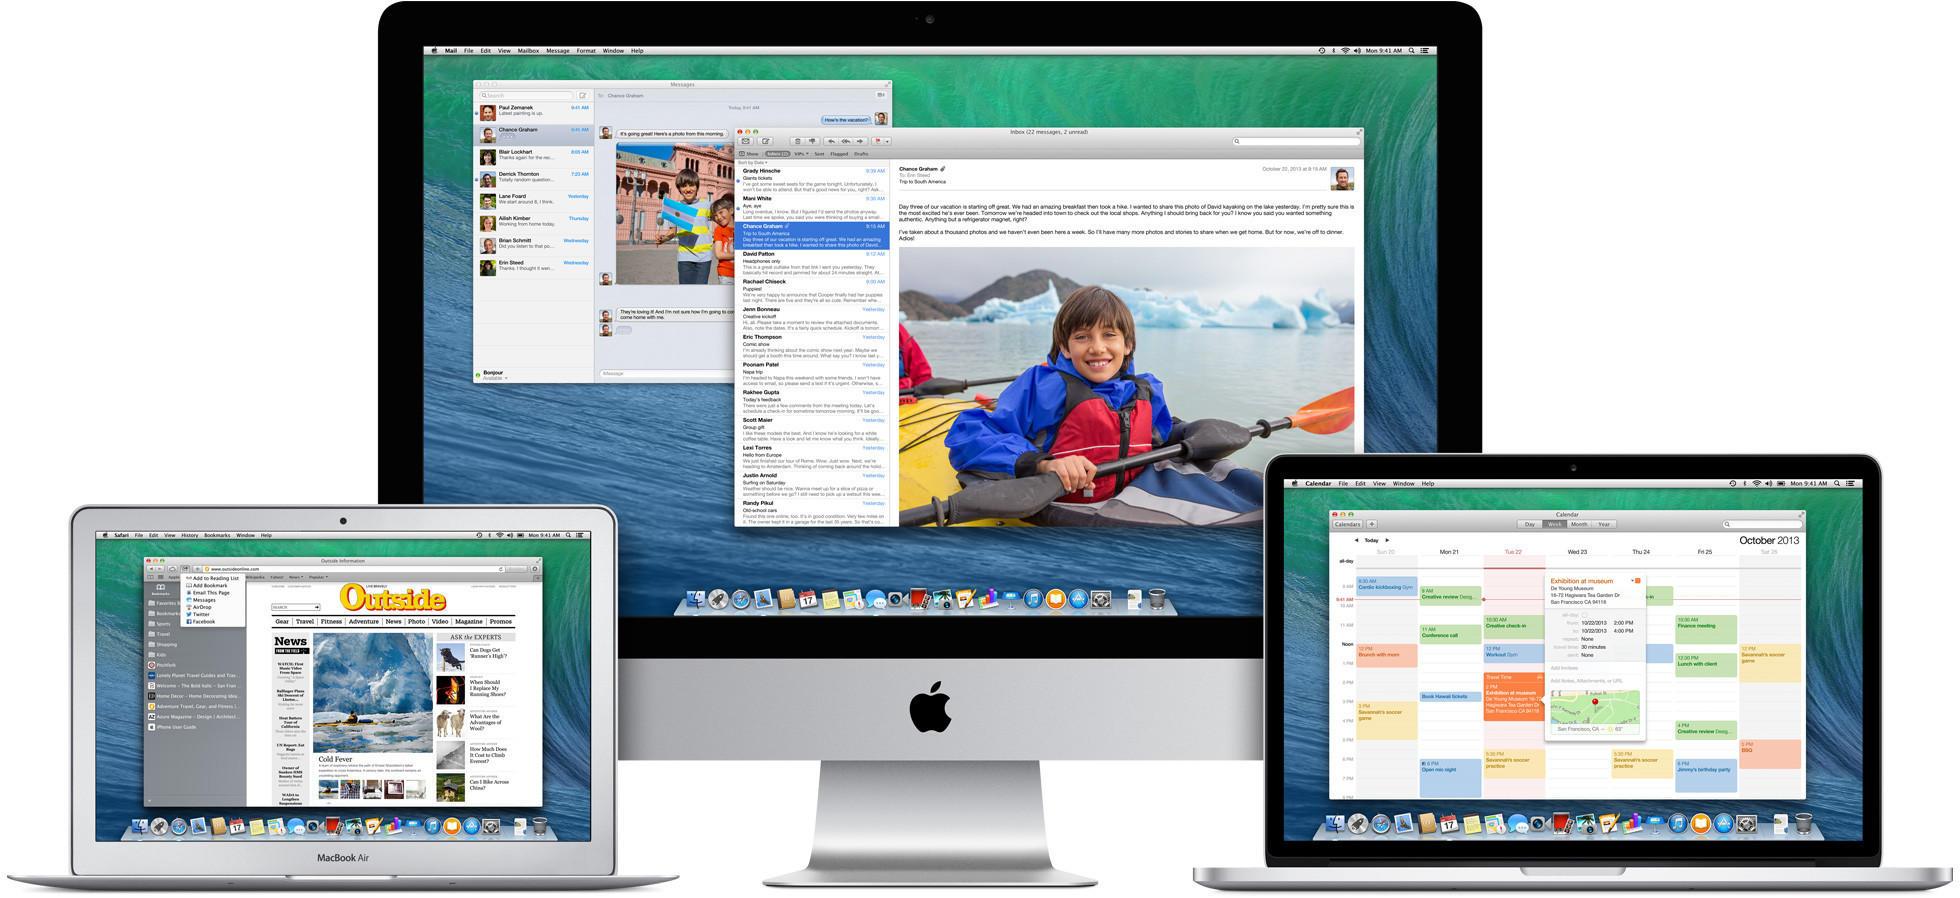 Apple laptop and desktop computers.